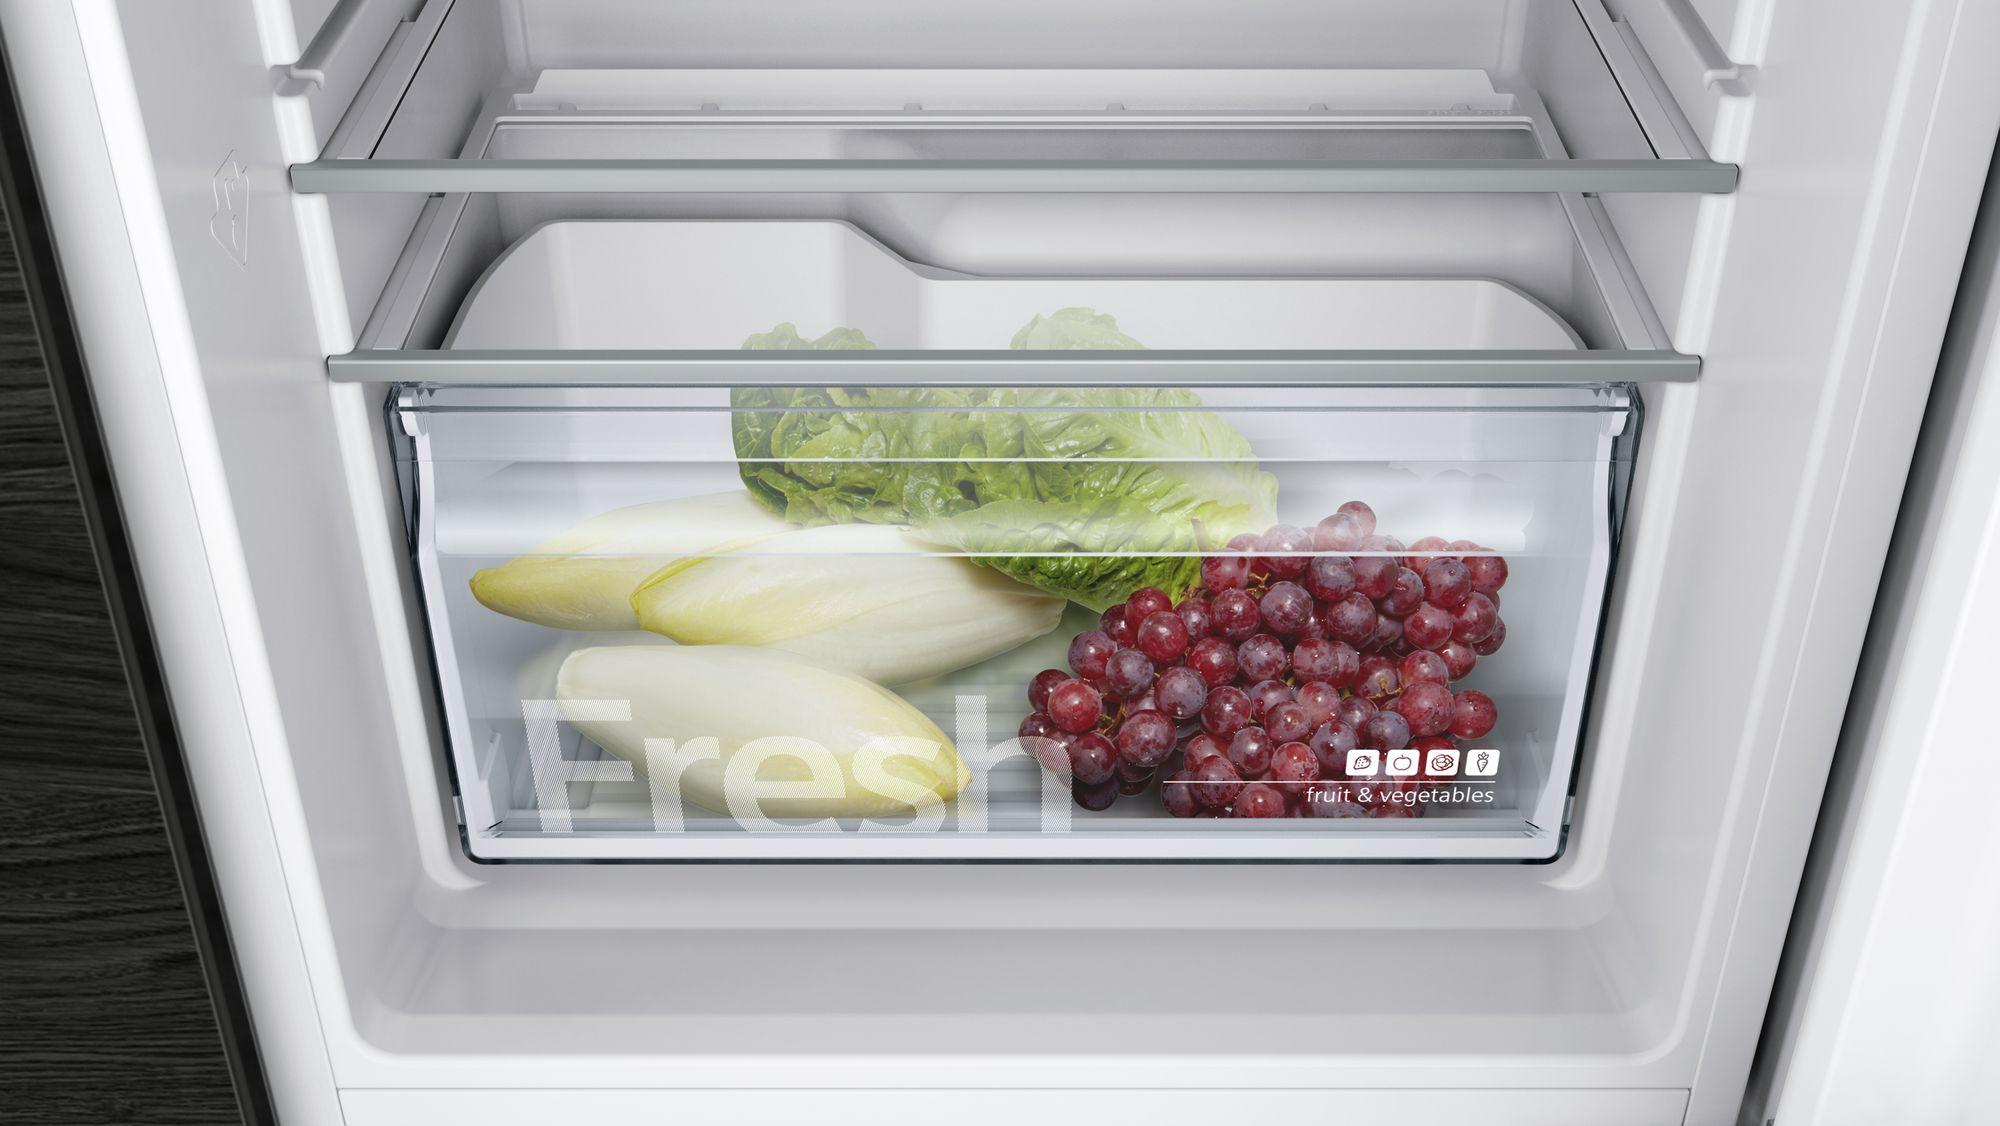 Kühlschrank Siemens : Siemens einbau kühlschrank flachscharnier technik ki lvf